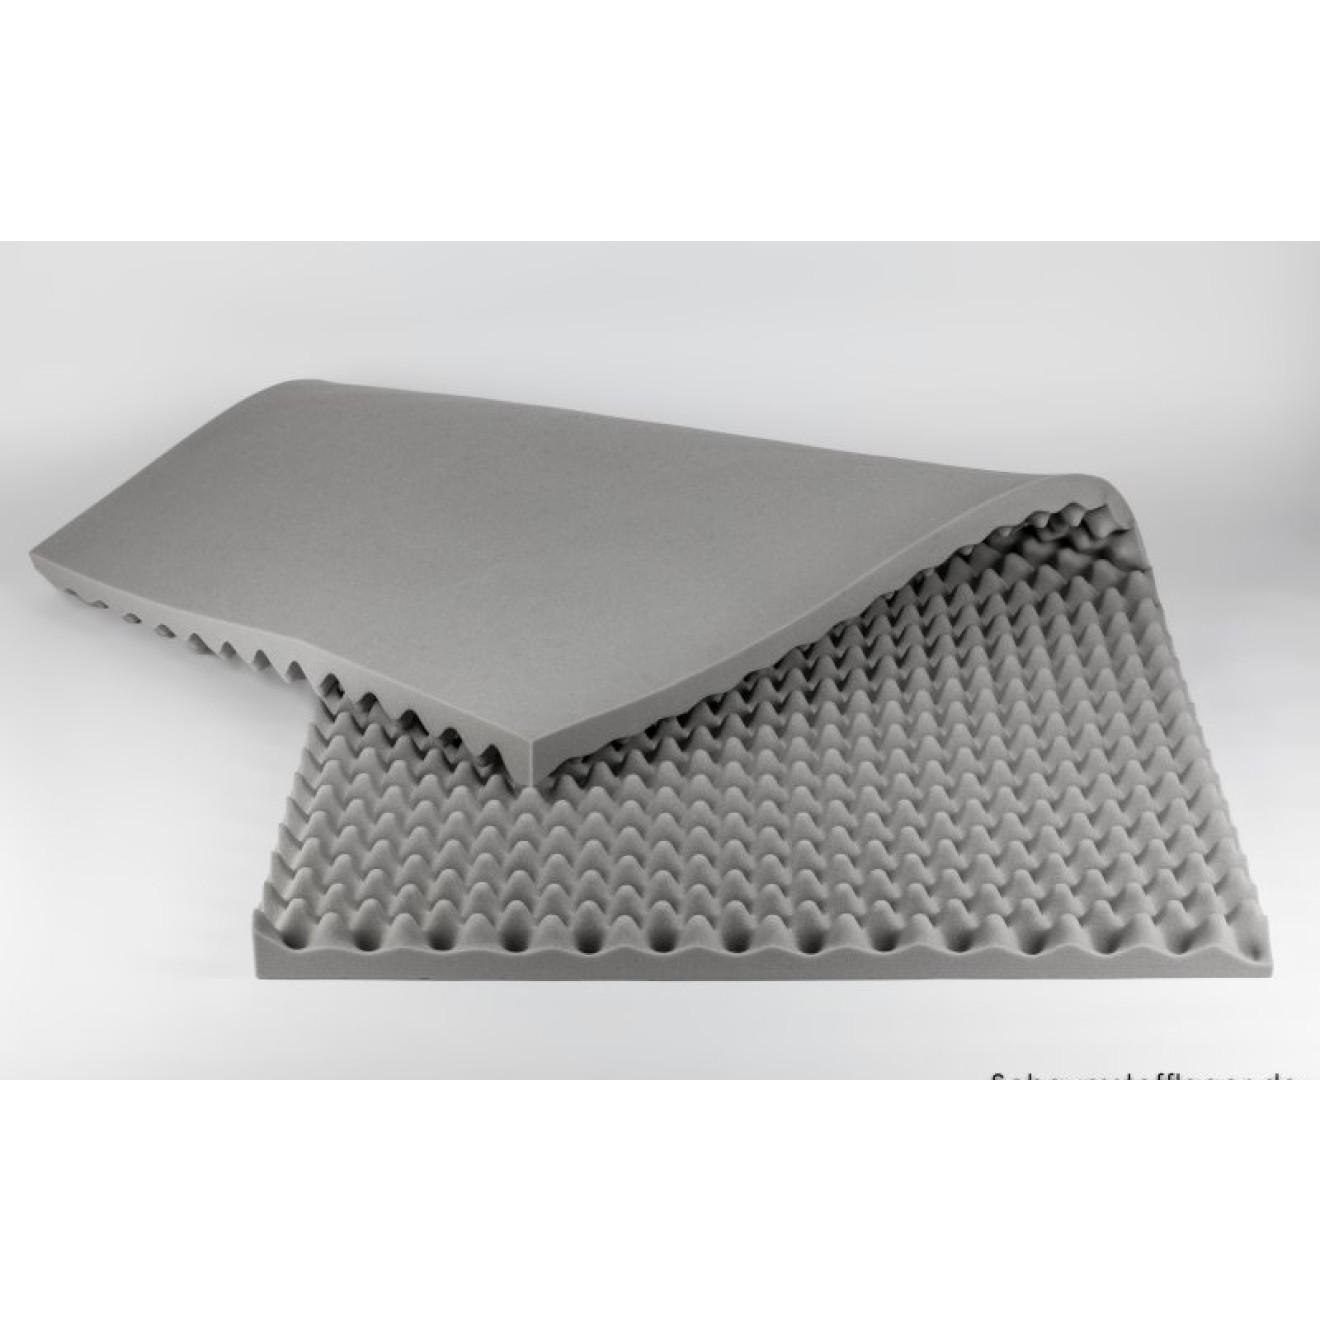 hier noppenschaumstoff online bestellen. Black Bedroom Furniture Sets. Home Design Ideas